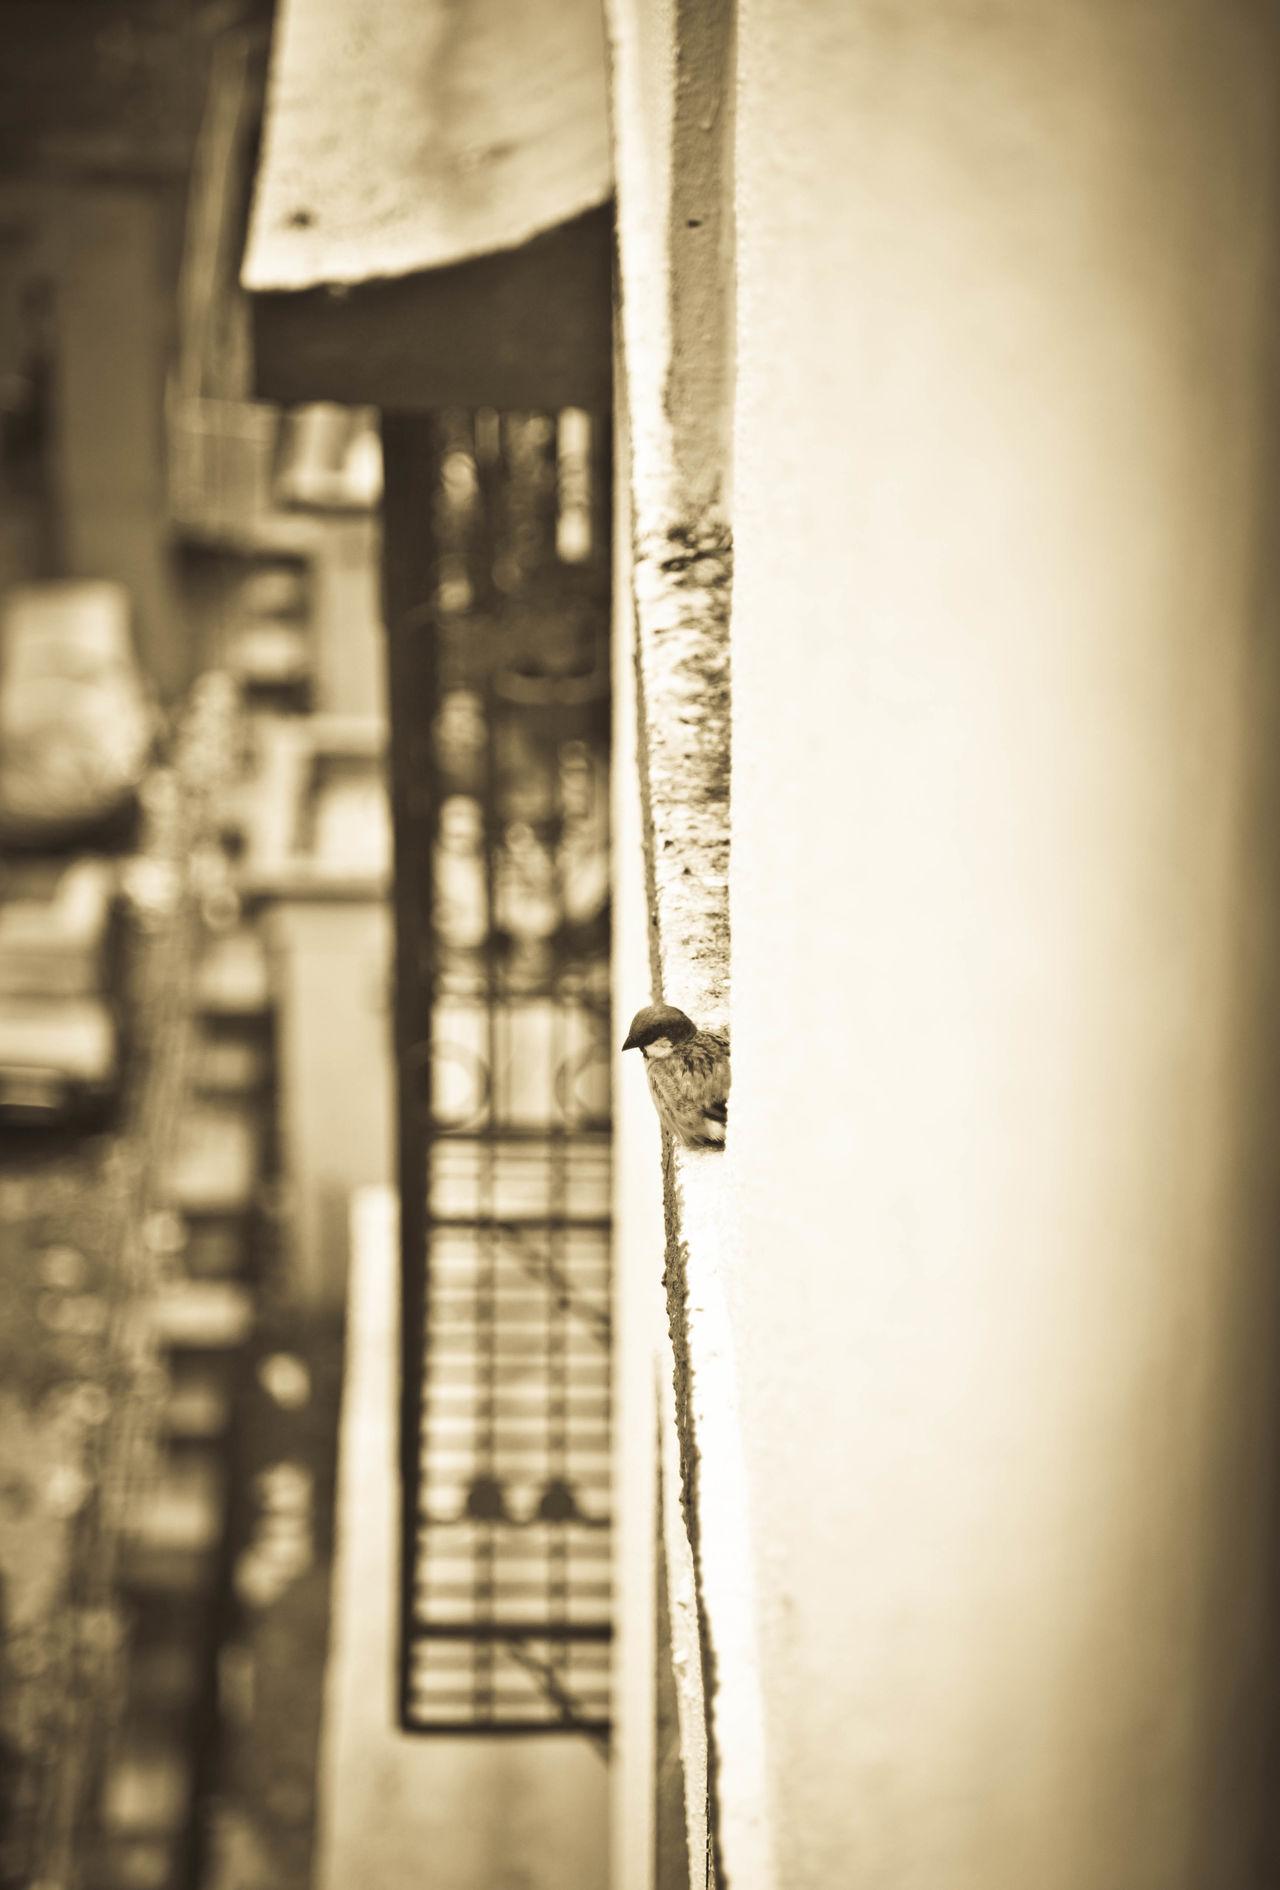 India Mumbai Busy Street Lone Bird Blackandwhite Nature Solitude Escape Zoned In